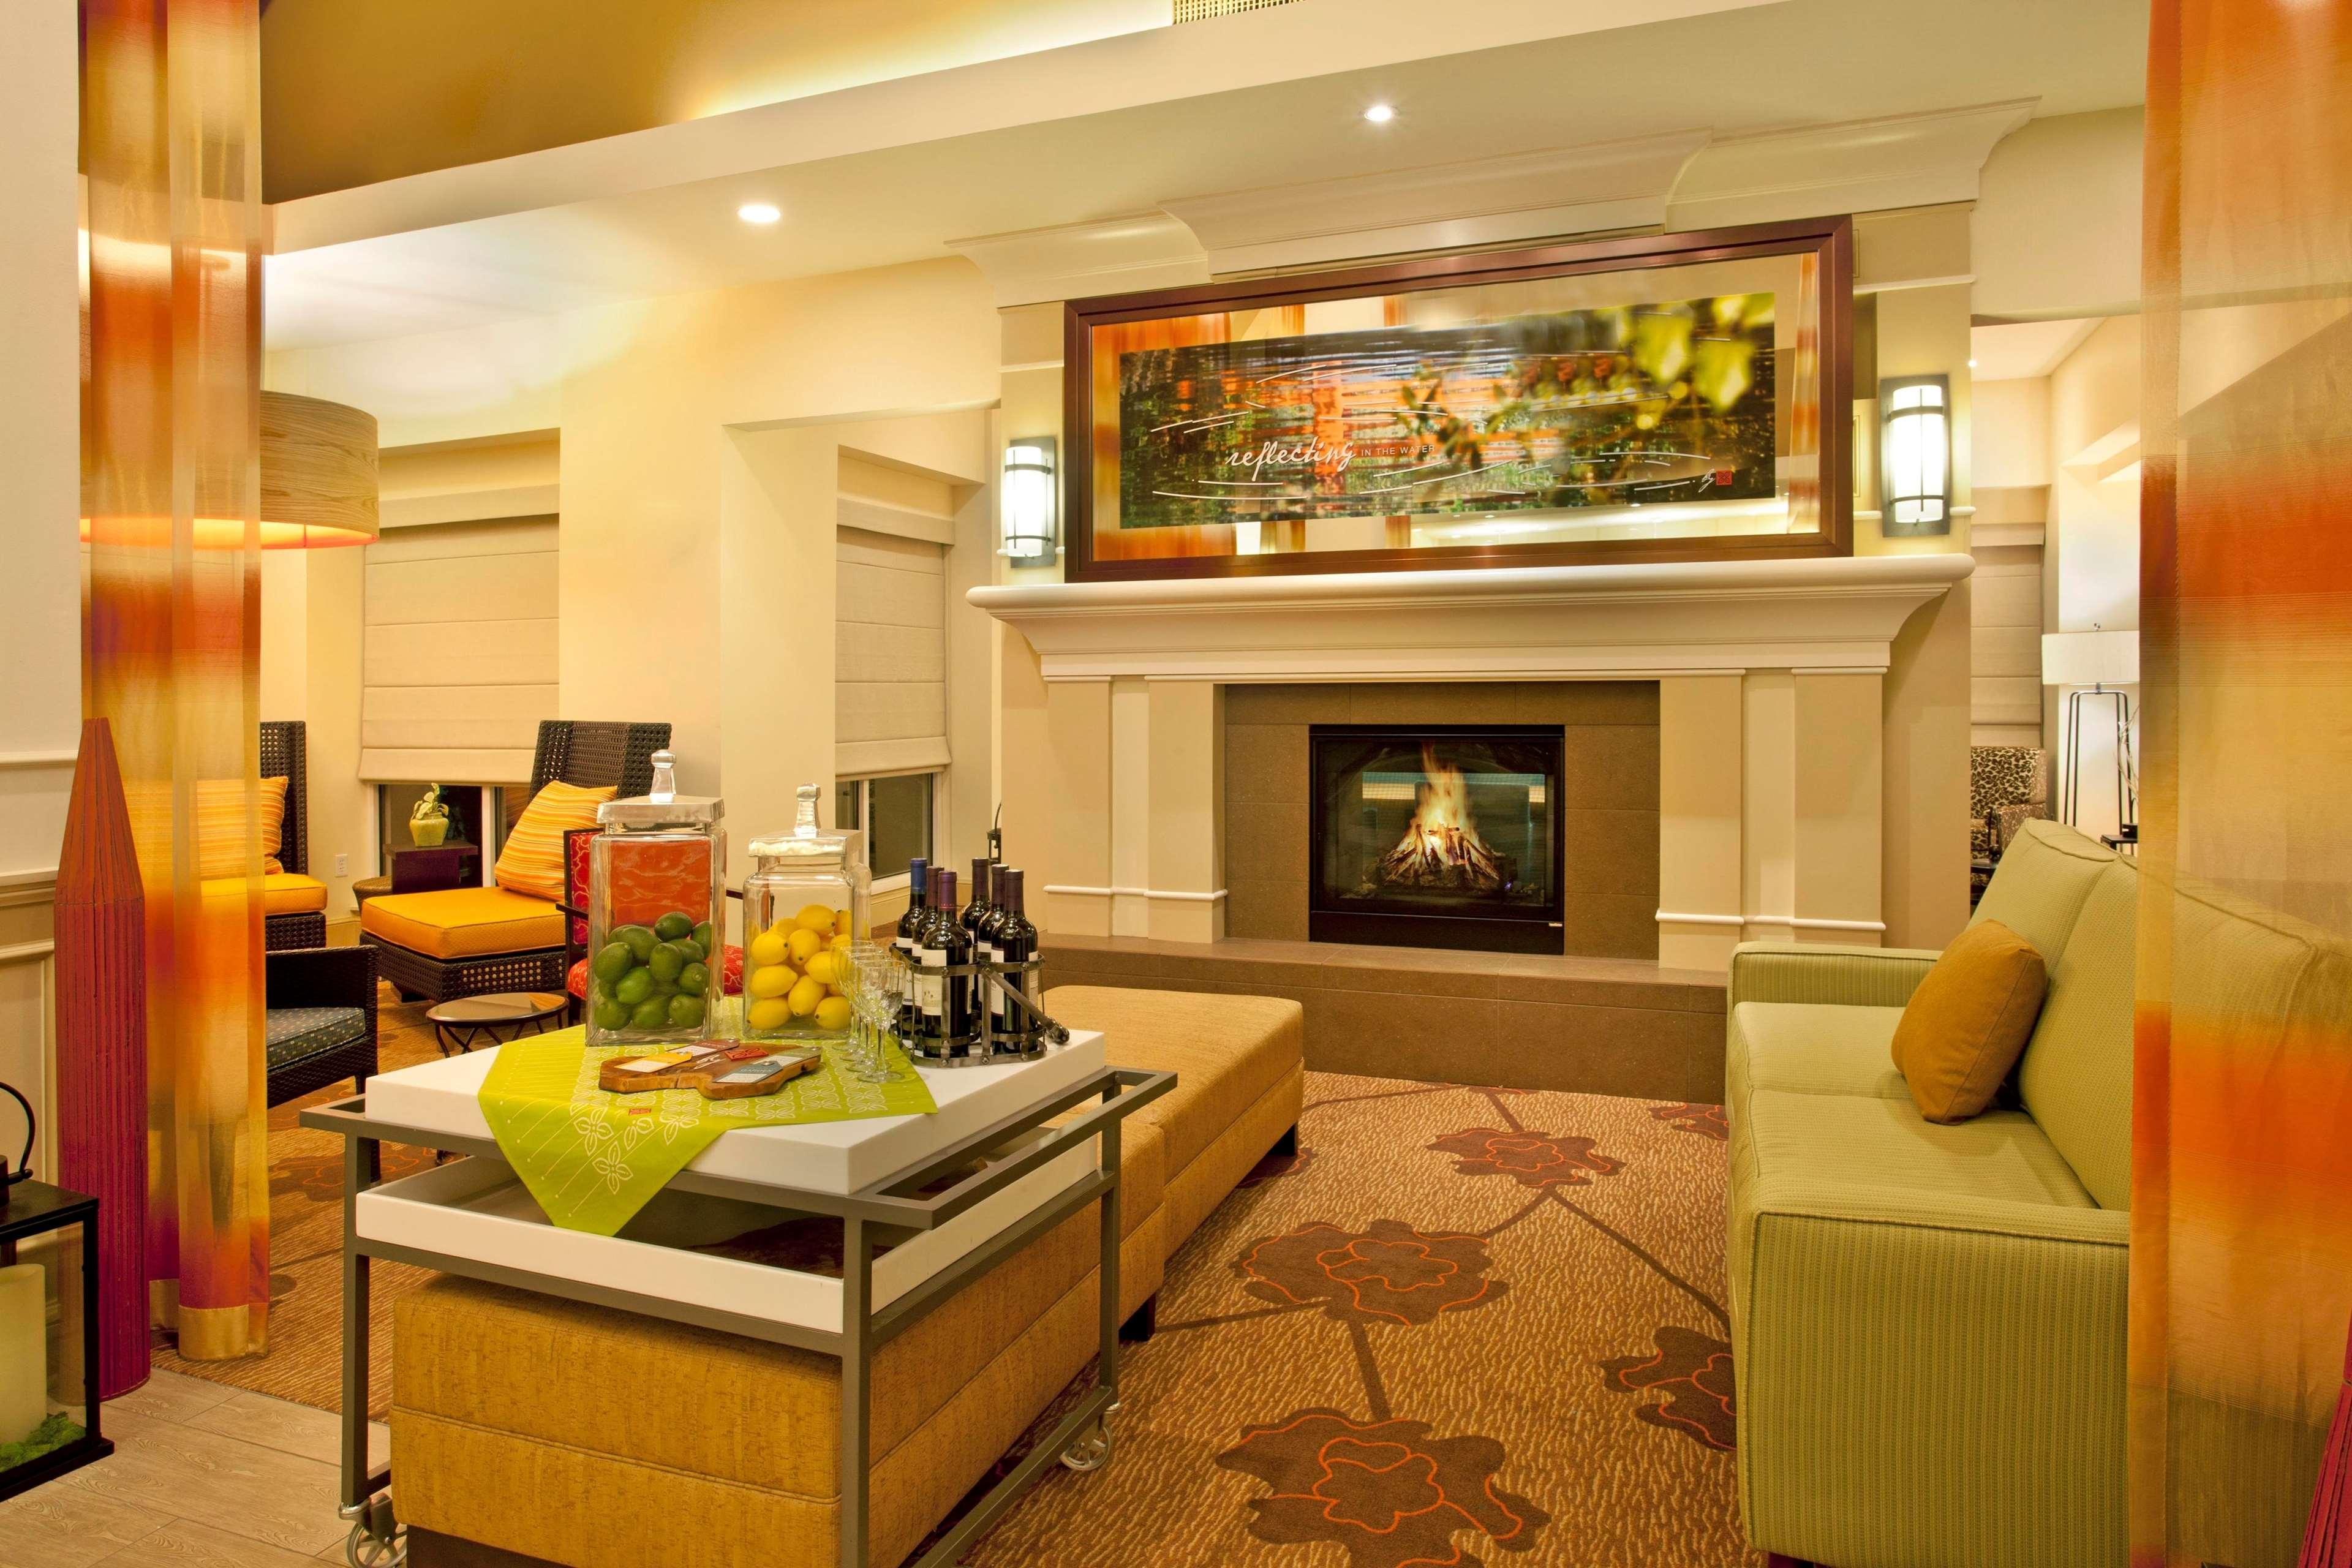 Hilton Garden Inn Fort Collins image 14